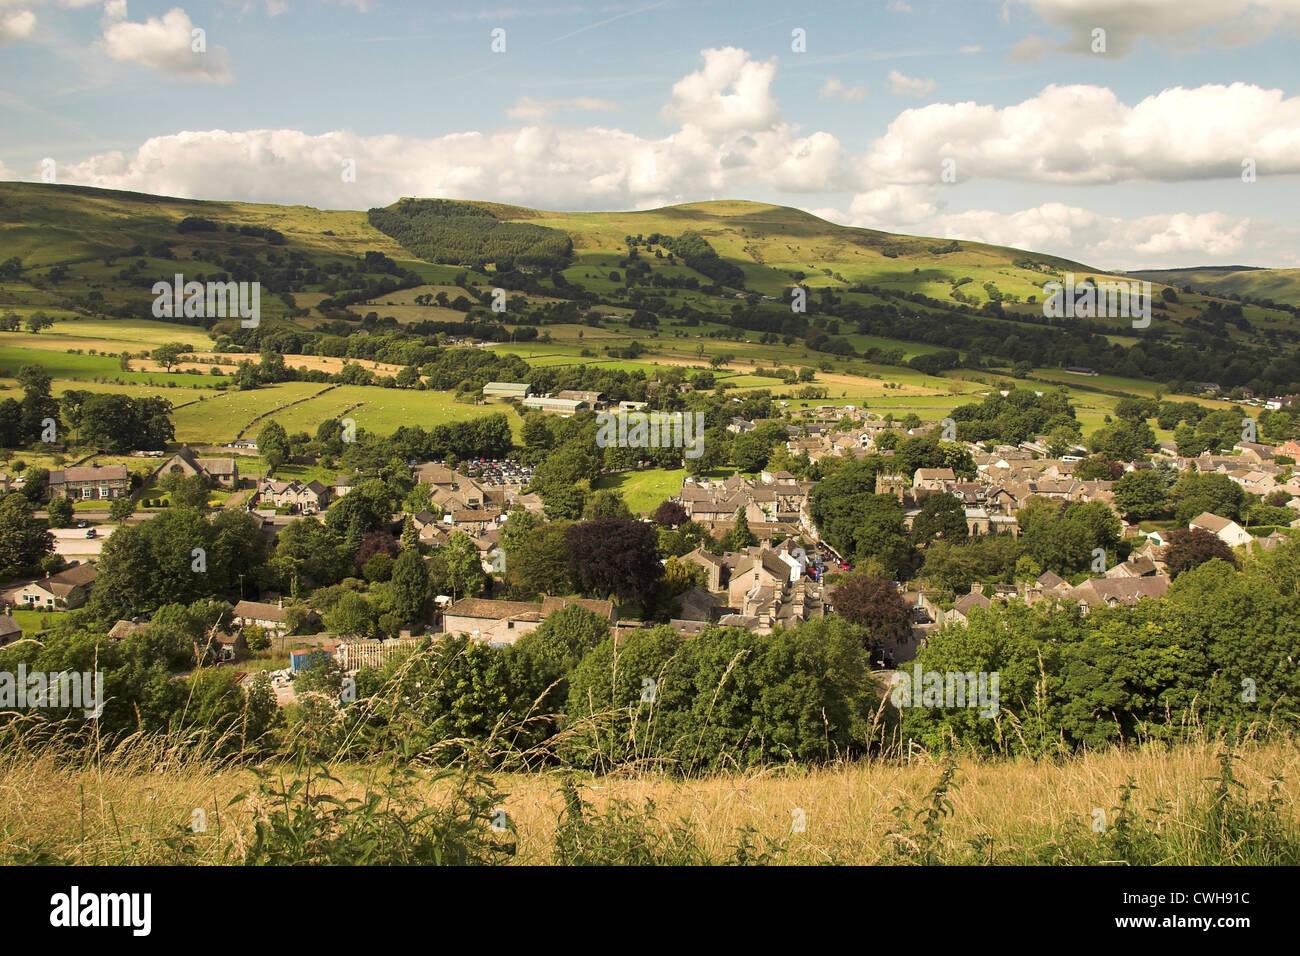 View over Castleton, from Peveril Castle, Peak District, Derbyshire, UK - Stock Image